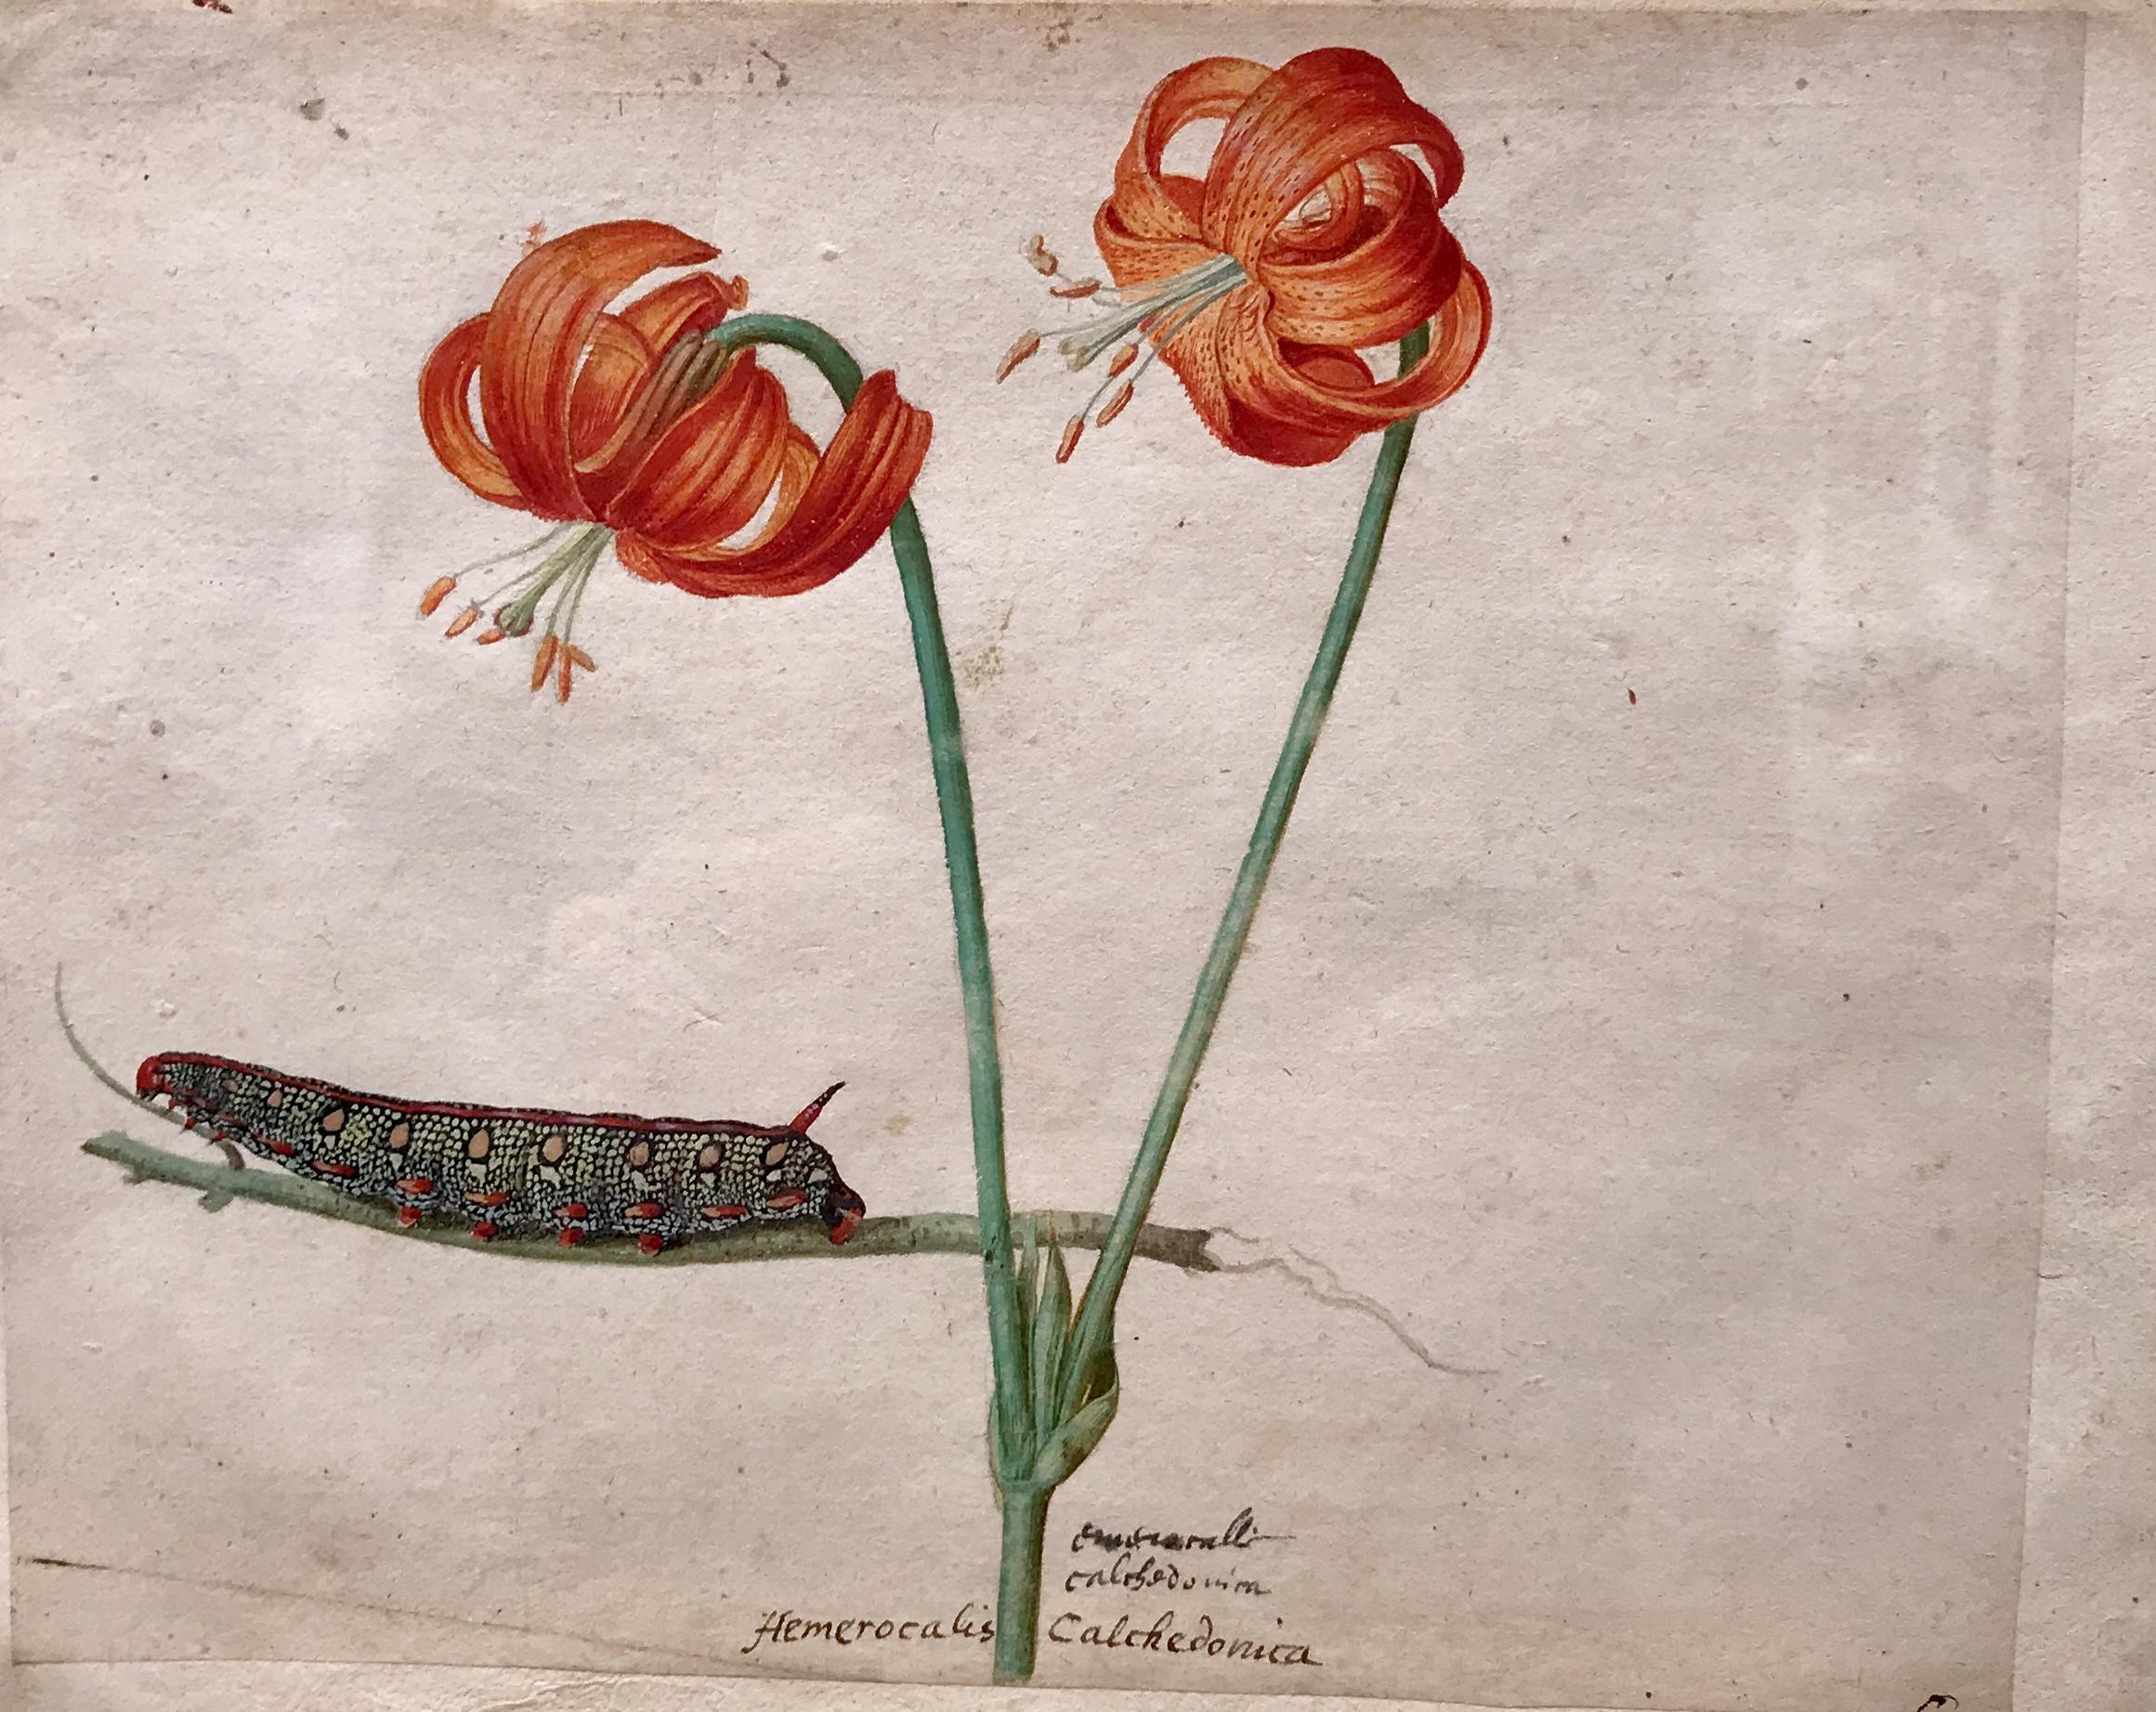 - Jacques Le Moyne de Morgues (Dieppe ca. 1533-1588 London)Two day lilies and a caterpillar